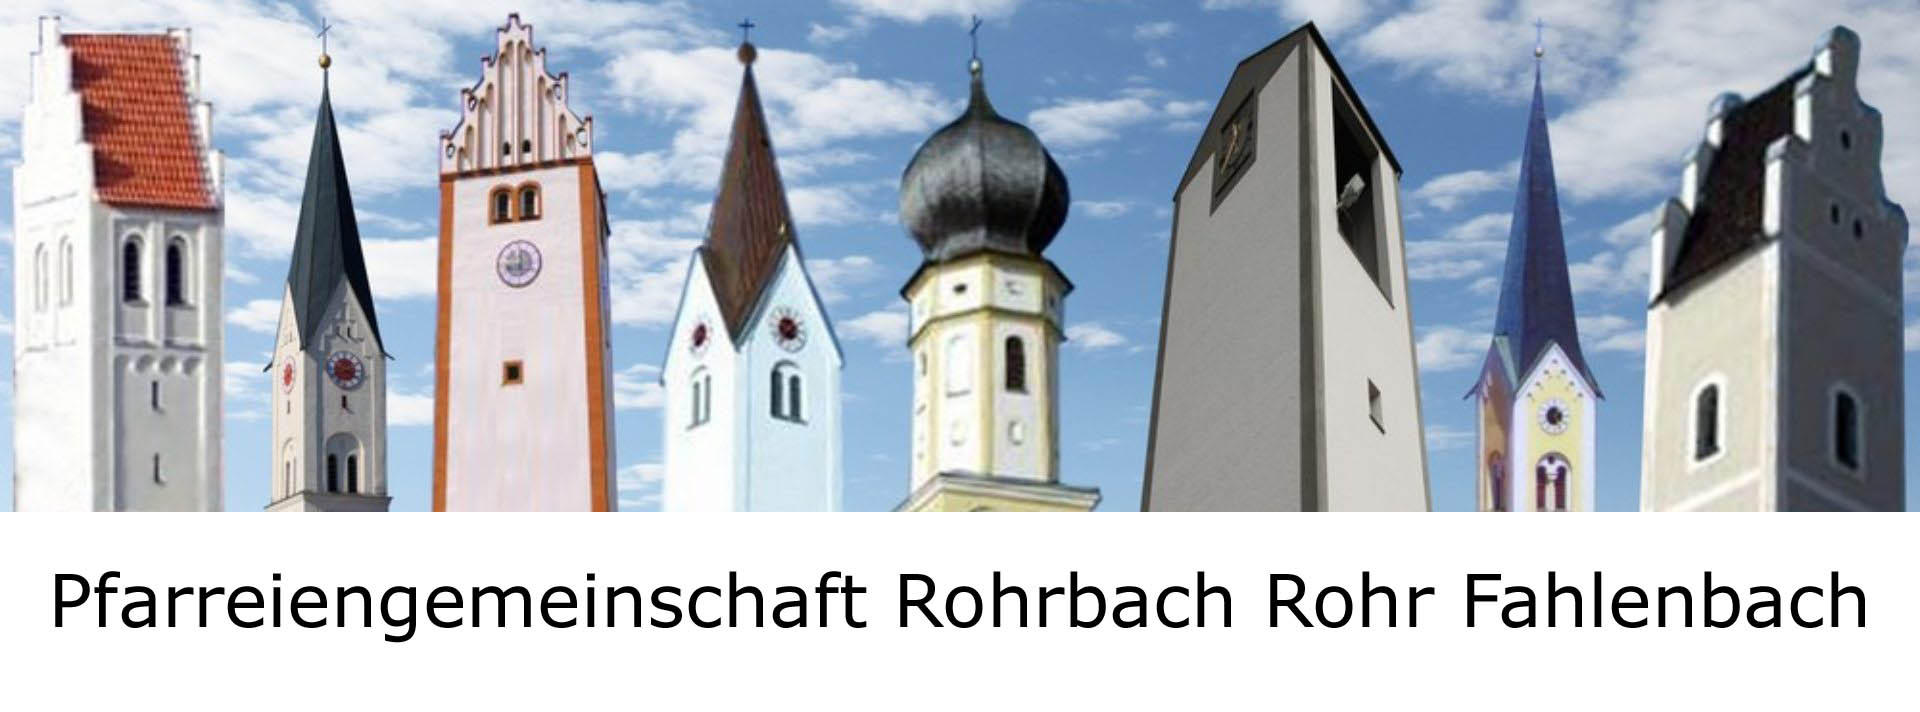 Pfarreiengemeinschaft Rohrbach-Rohr-Fahlenbach